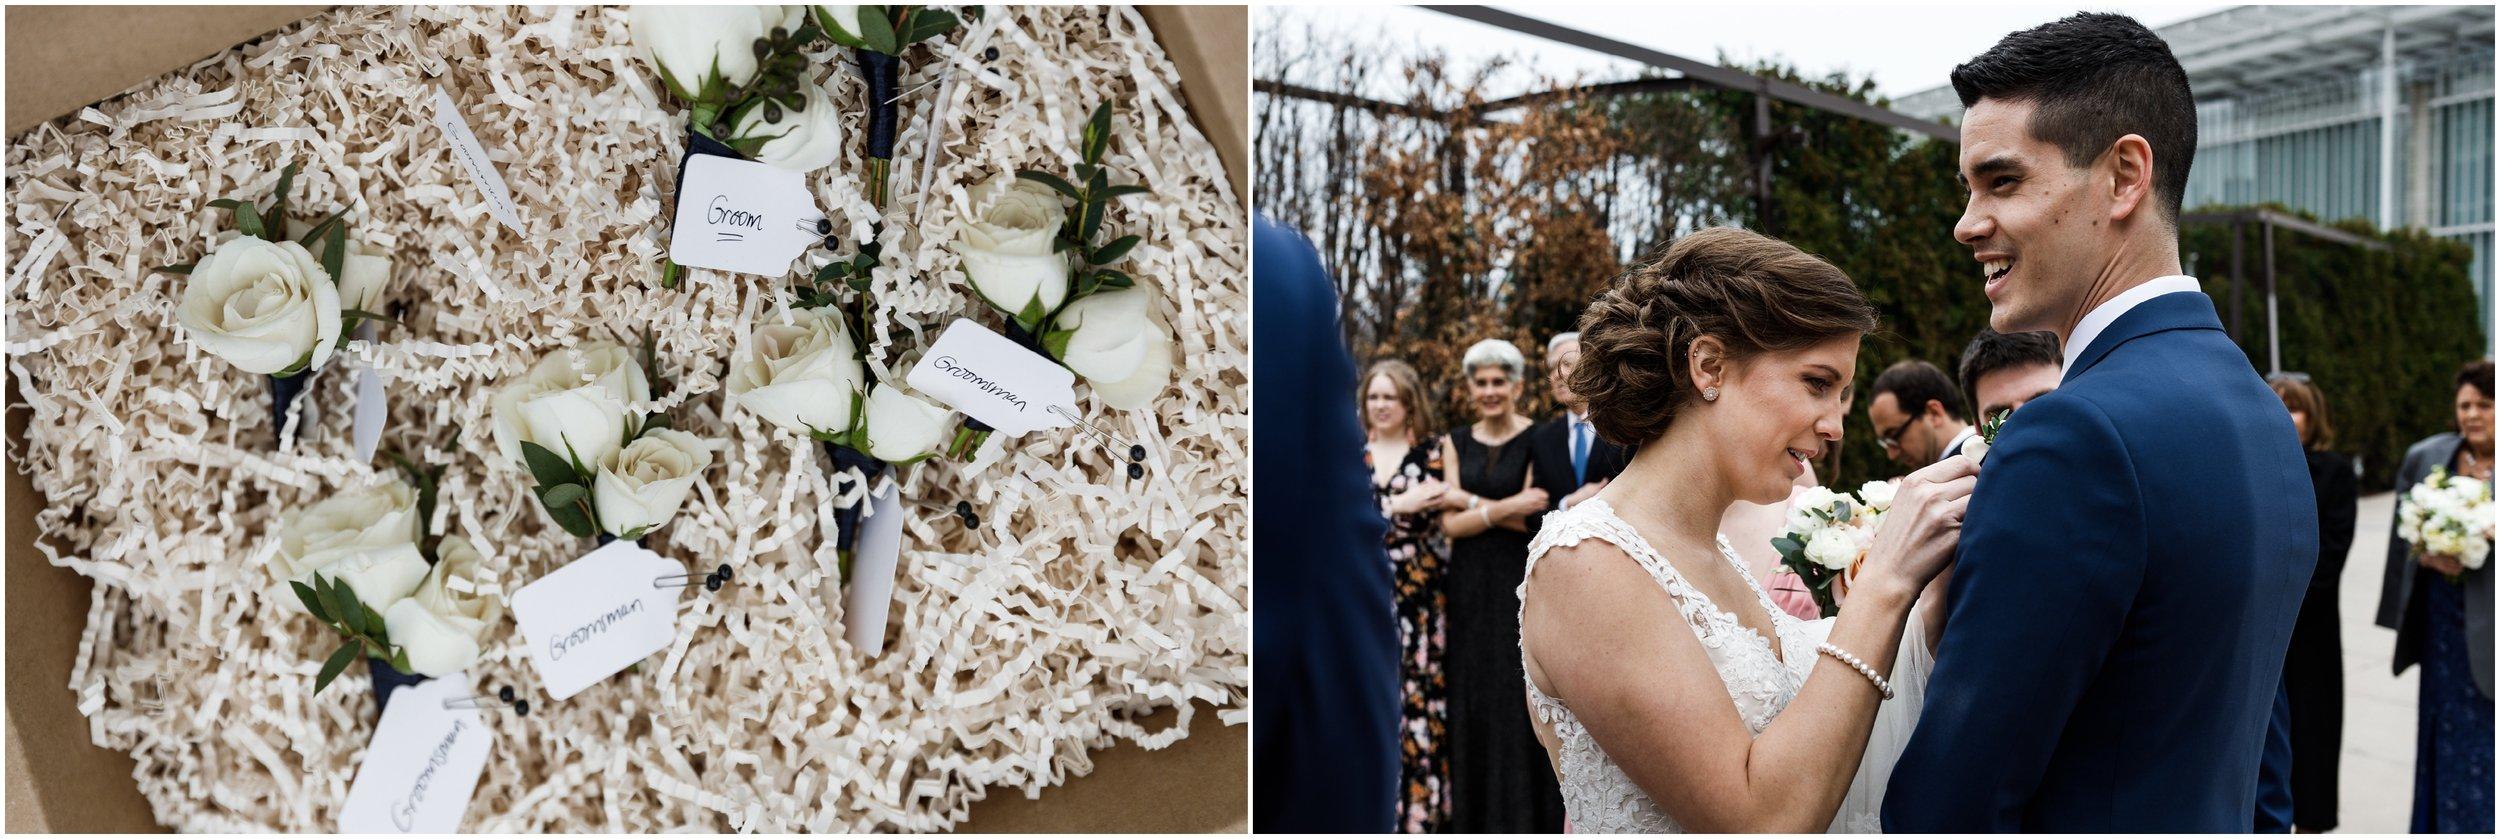 detail shot of wedding boutonnieres